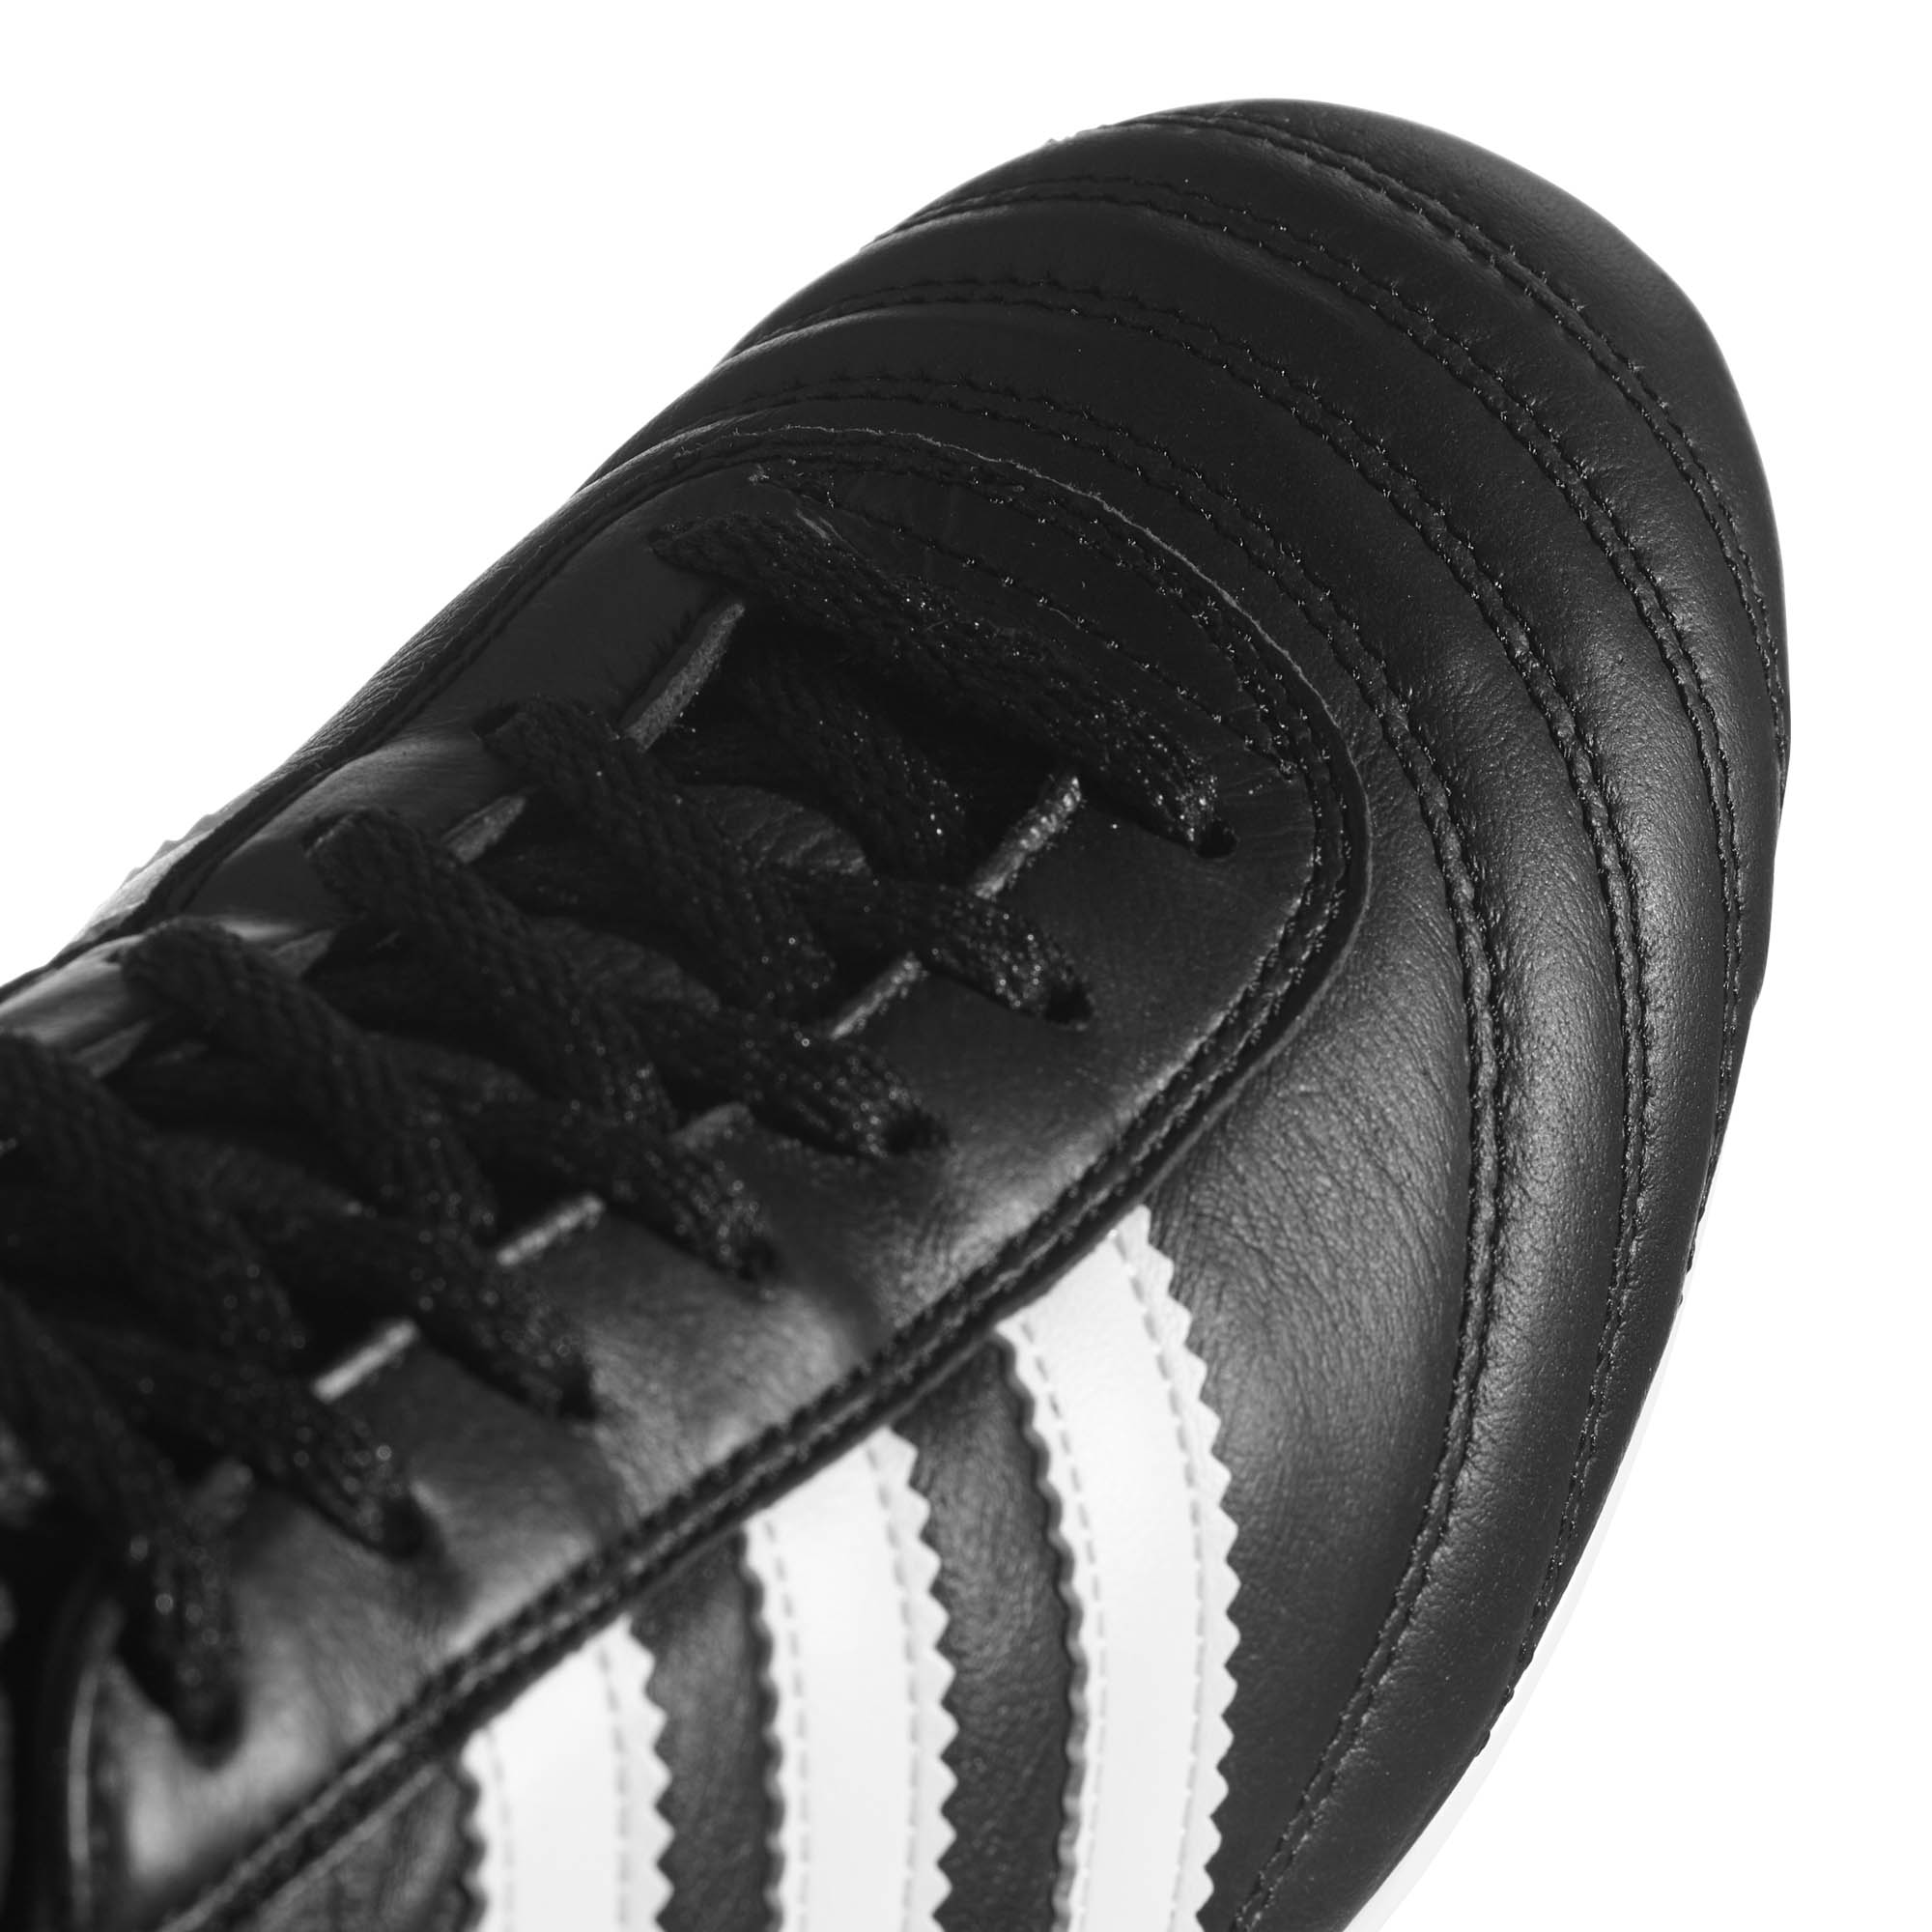 ADIDAS-COPA-MUNDIAL-FG-TERRA-FERMA-calcio-da-uomo-Boot-nero-bianco miniatura 8